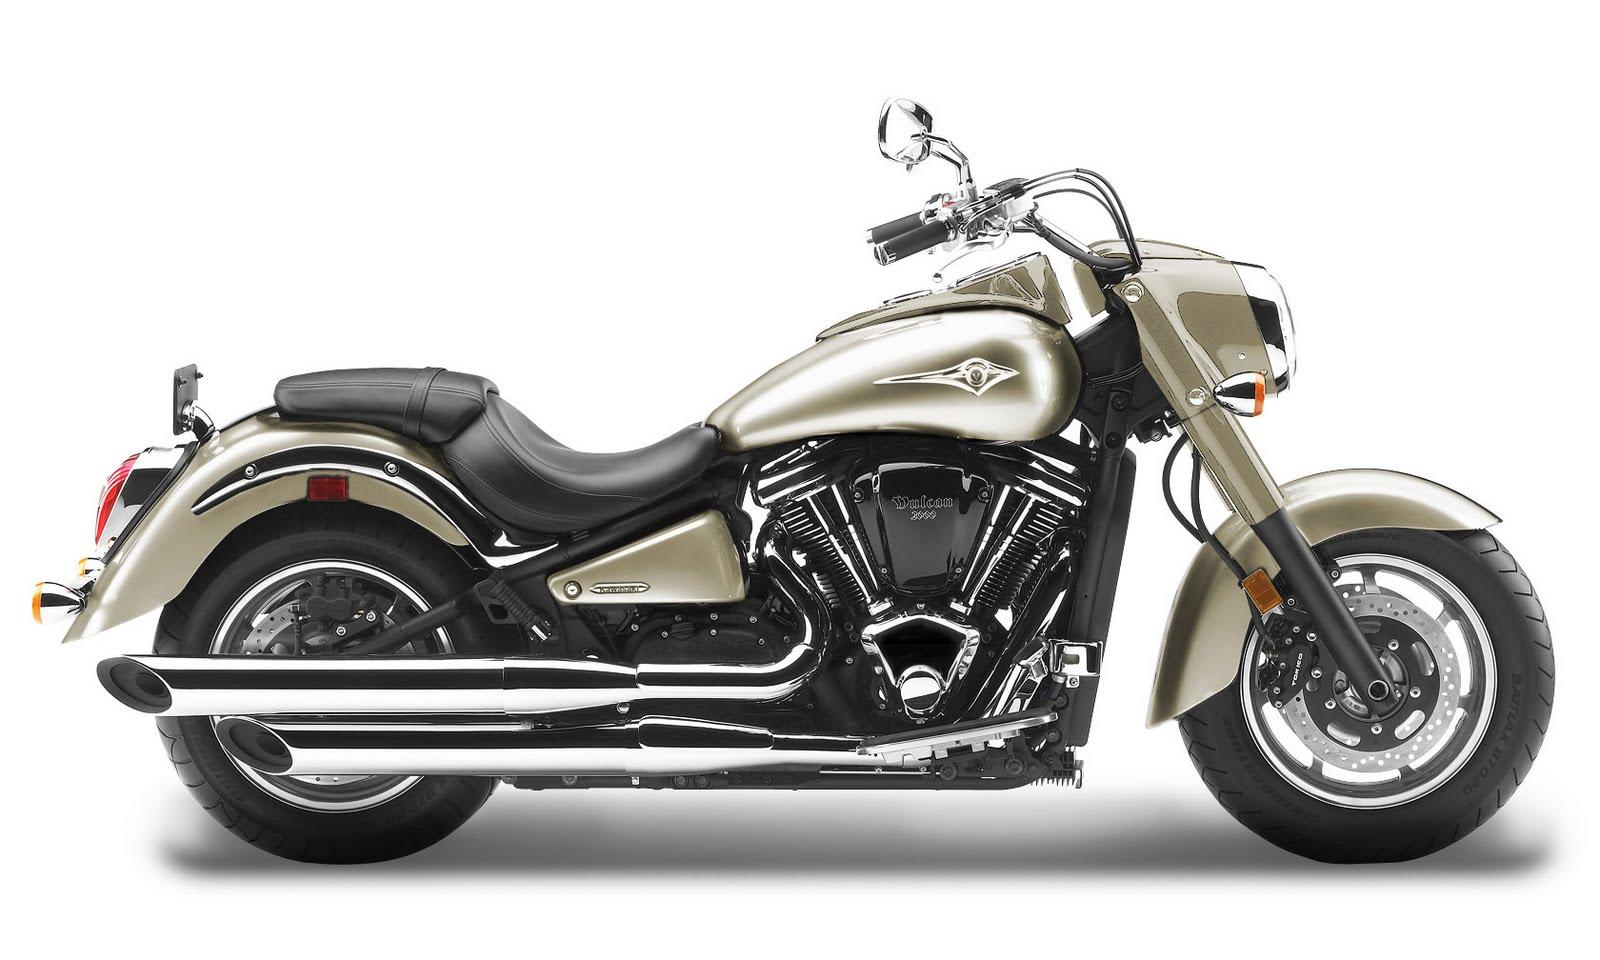 motorcycles  Kawasaki Vulcan 2000 Classic Lt